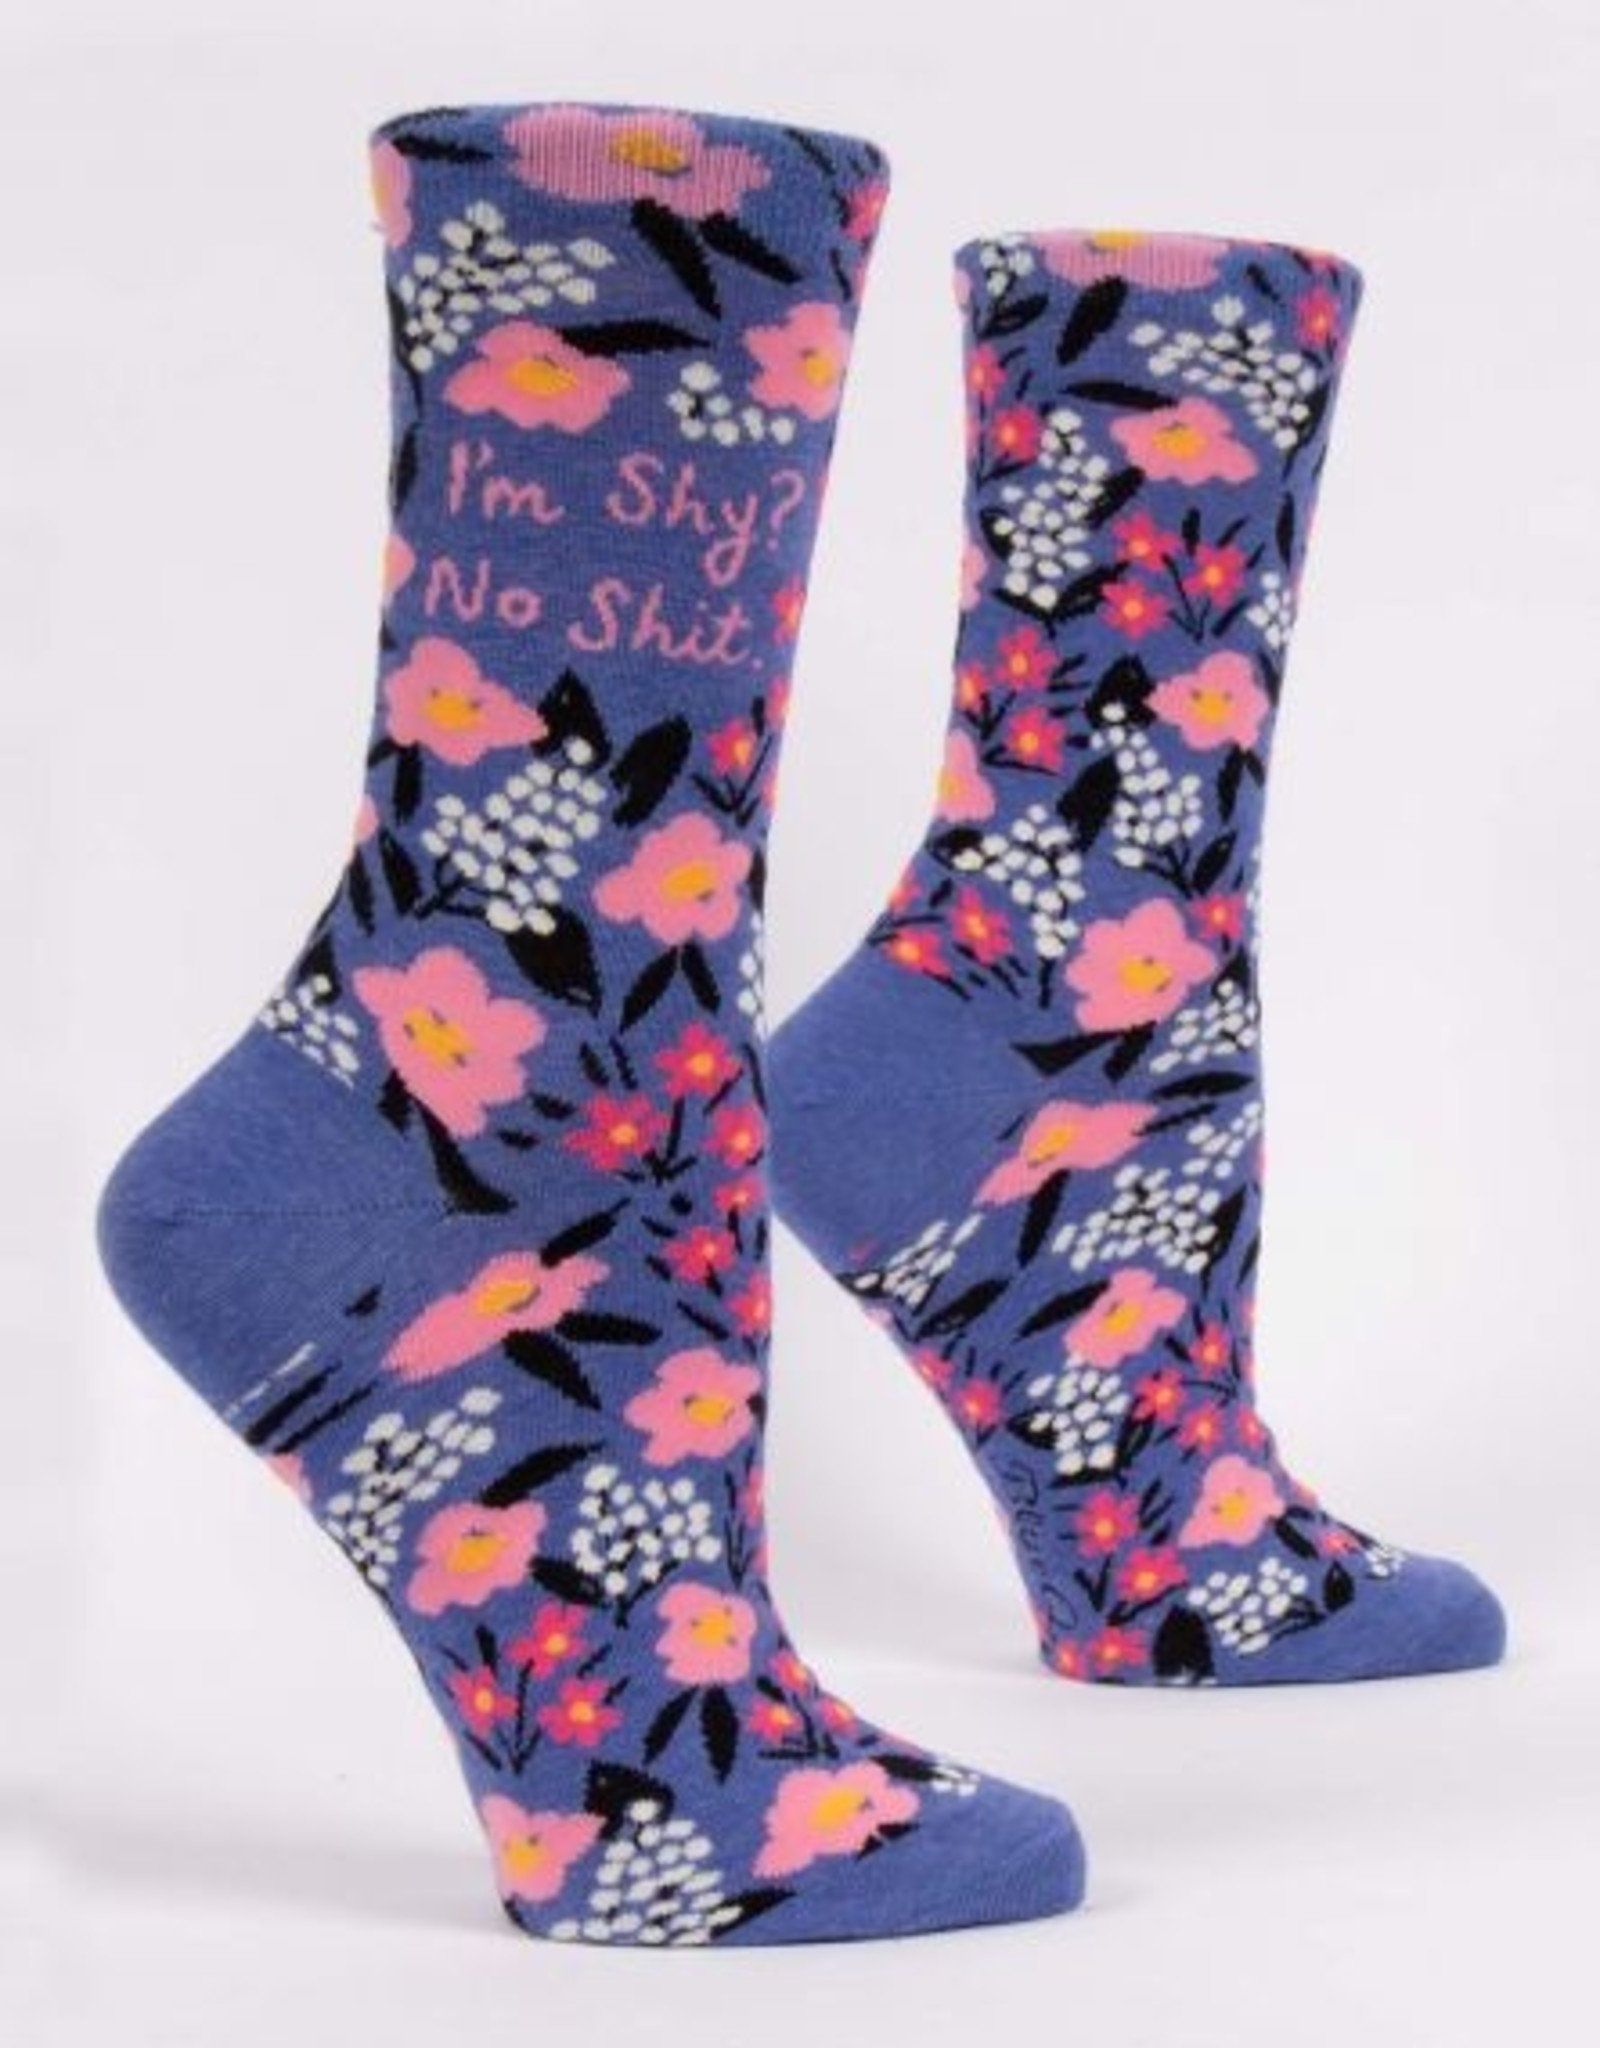 Blue Q Socks, I'm Shy. No Sh!t